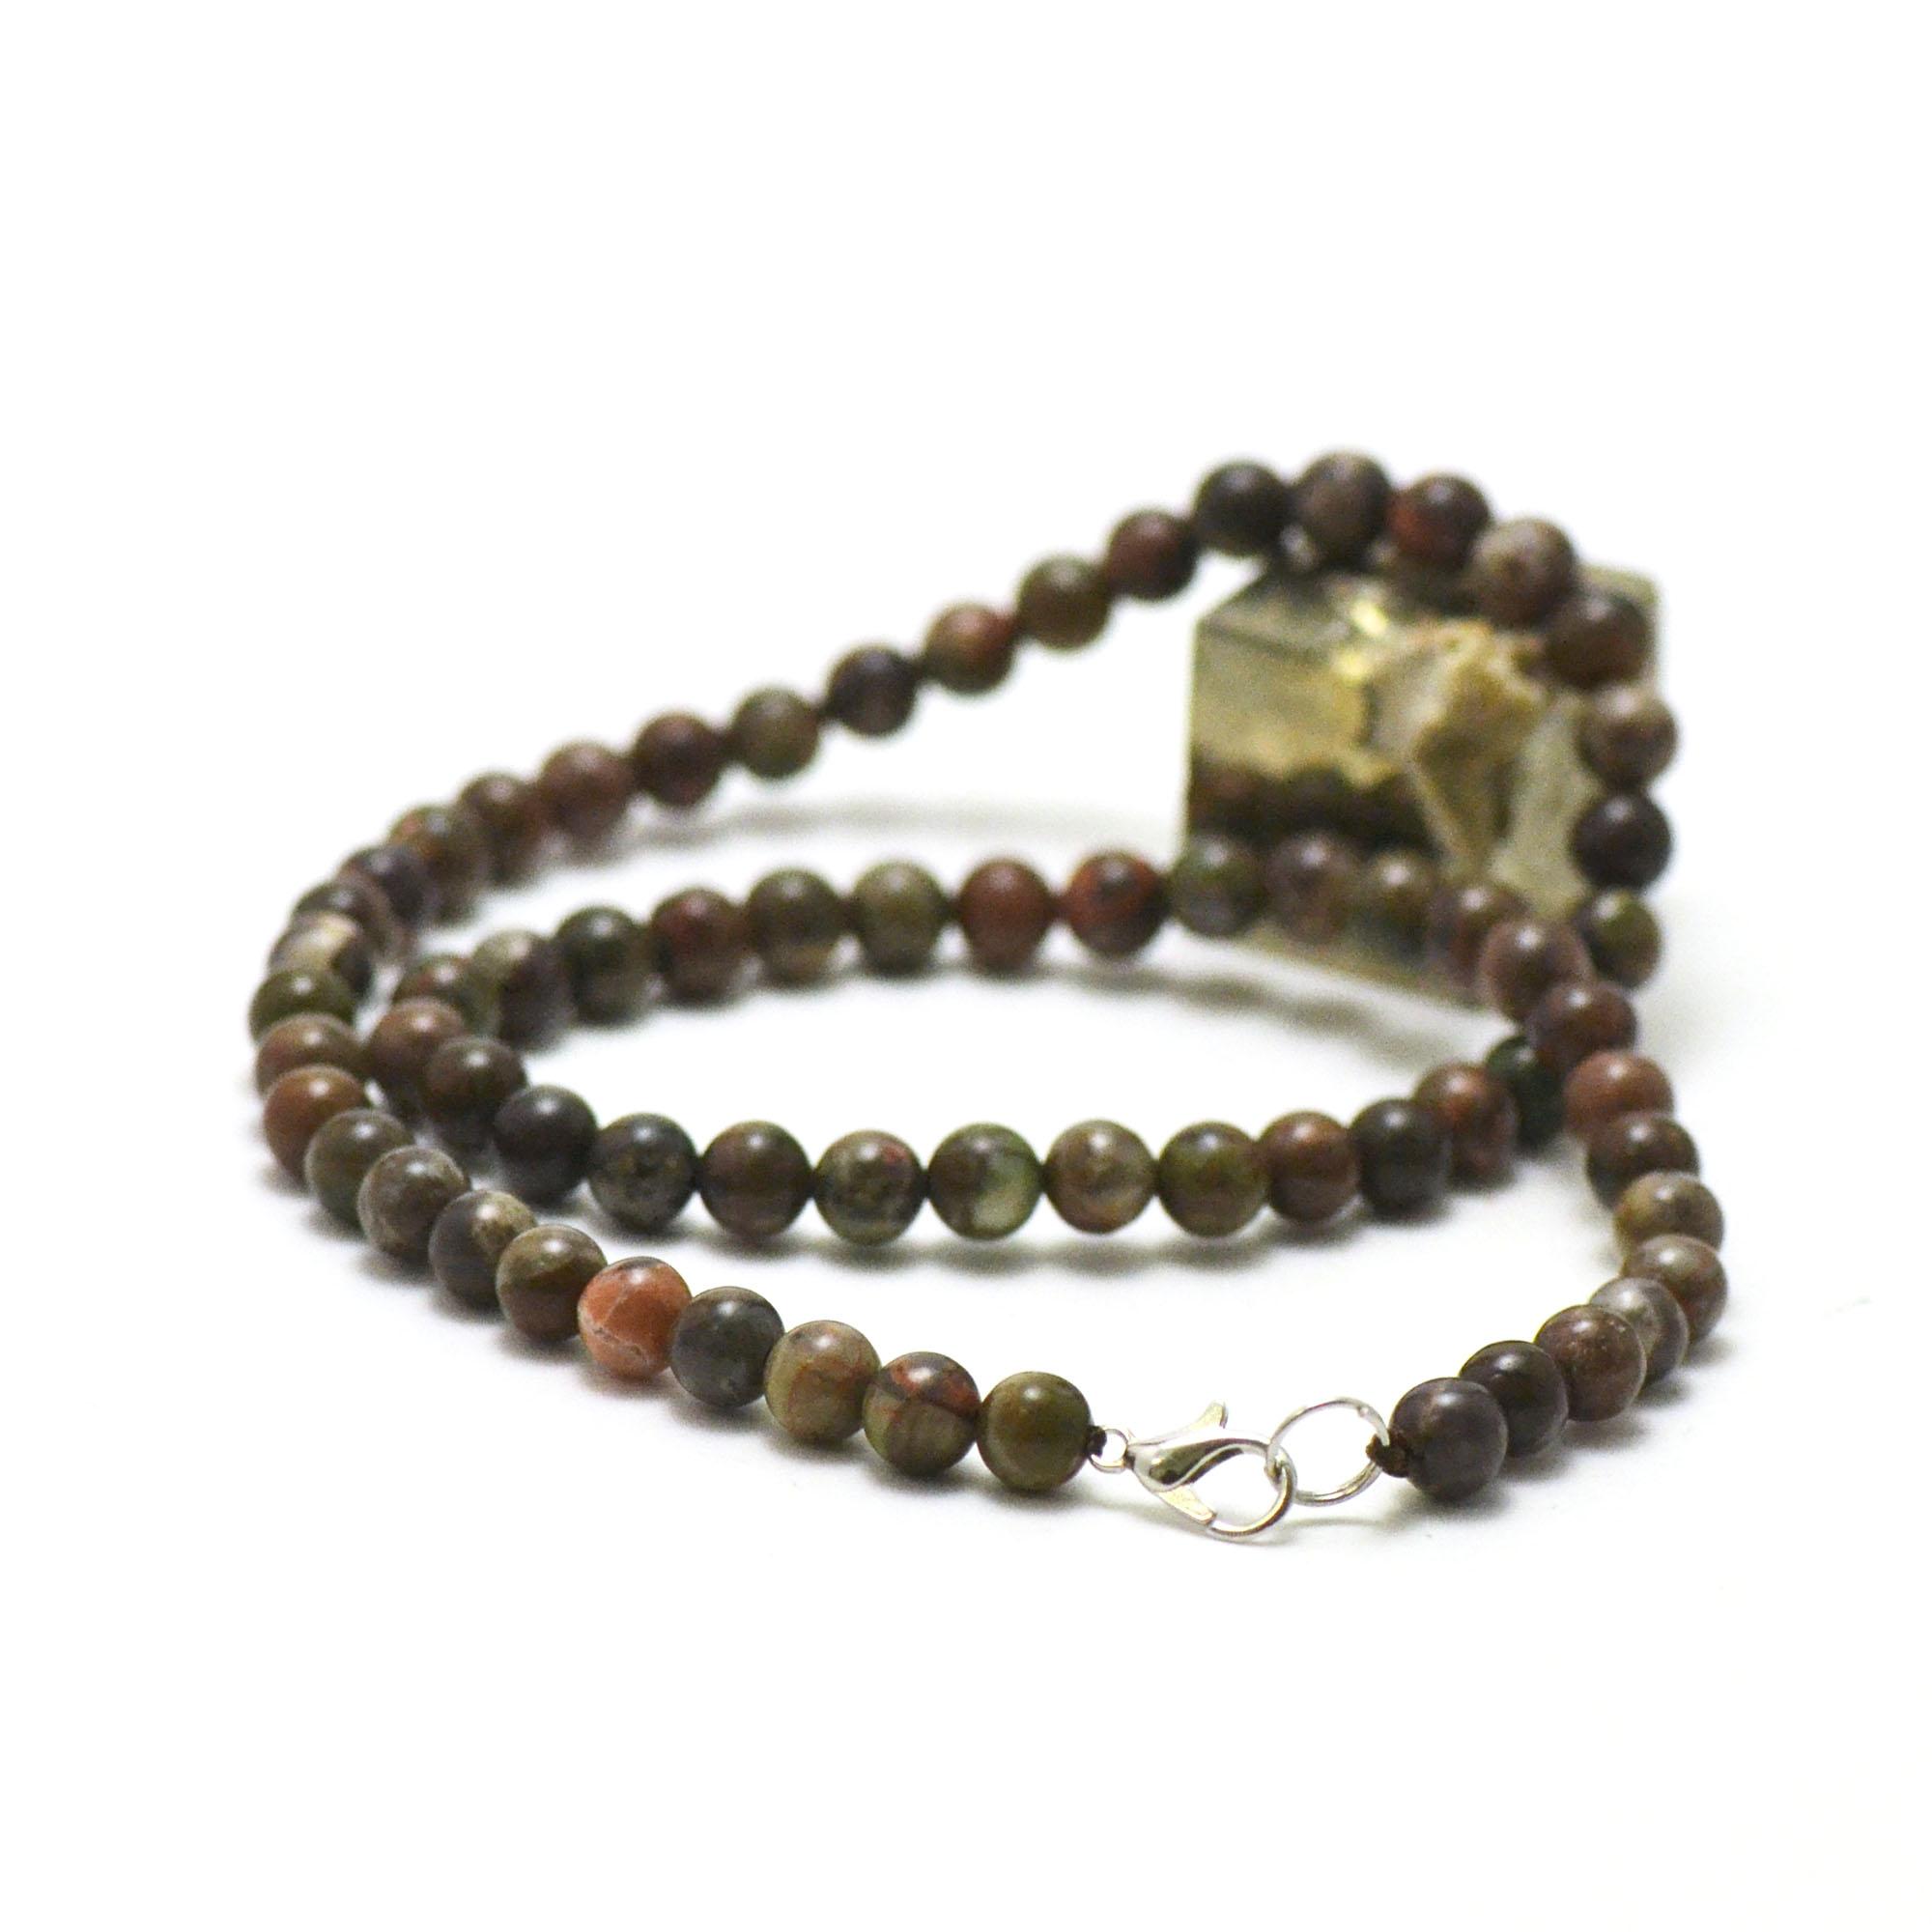 Collier Rhyolite, perle ronde 6 mm